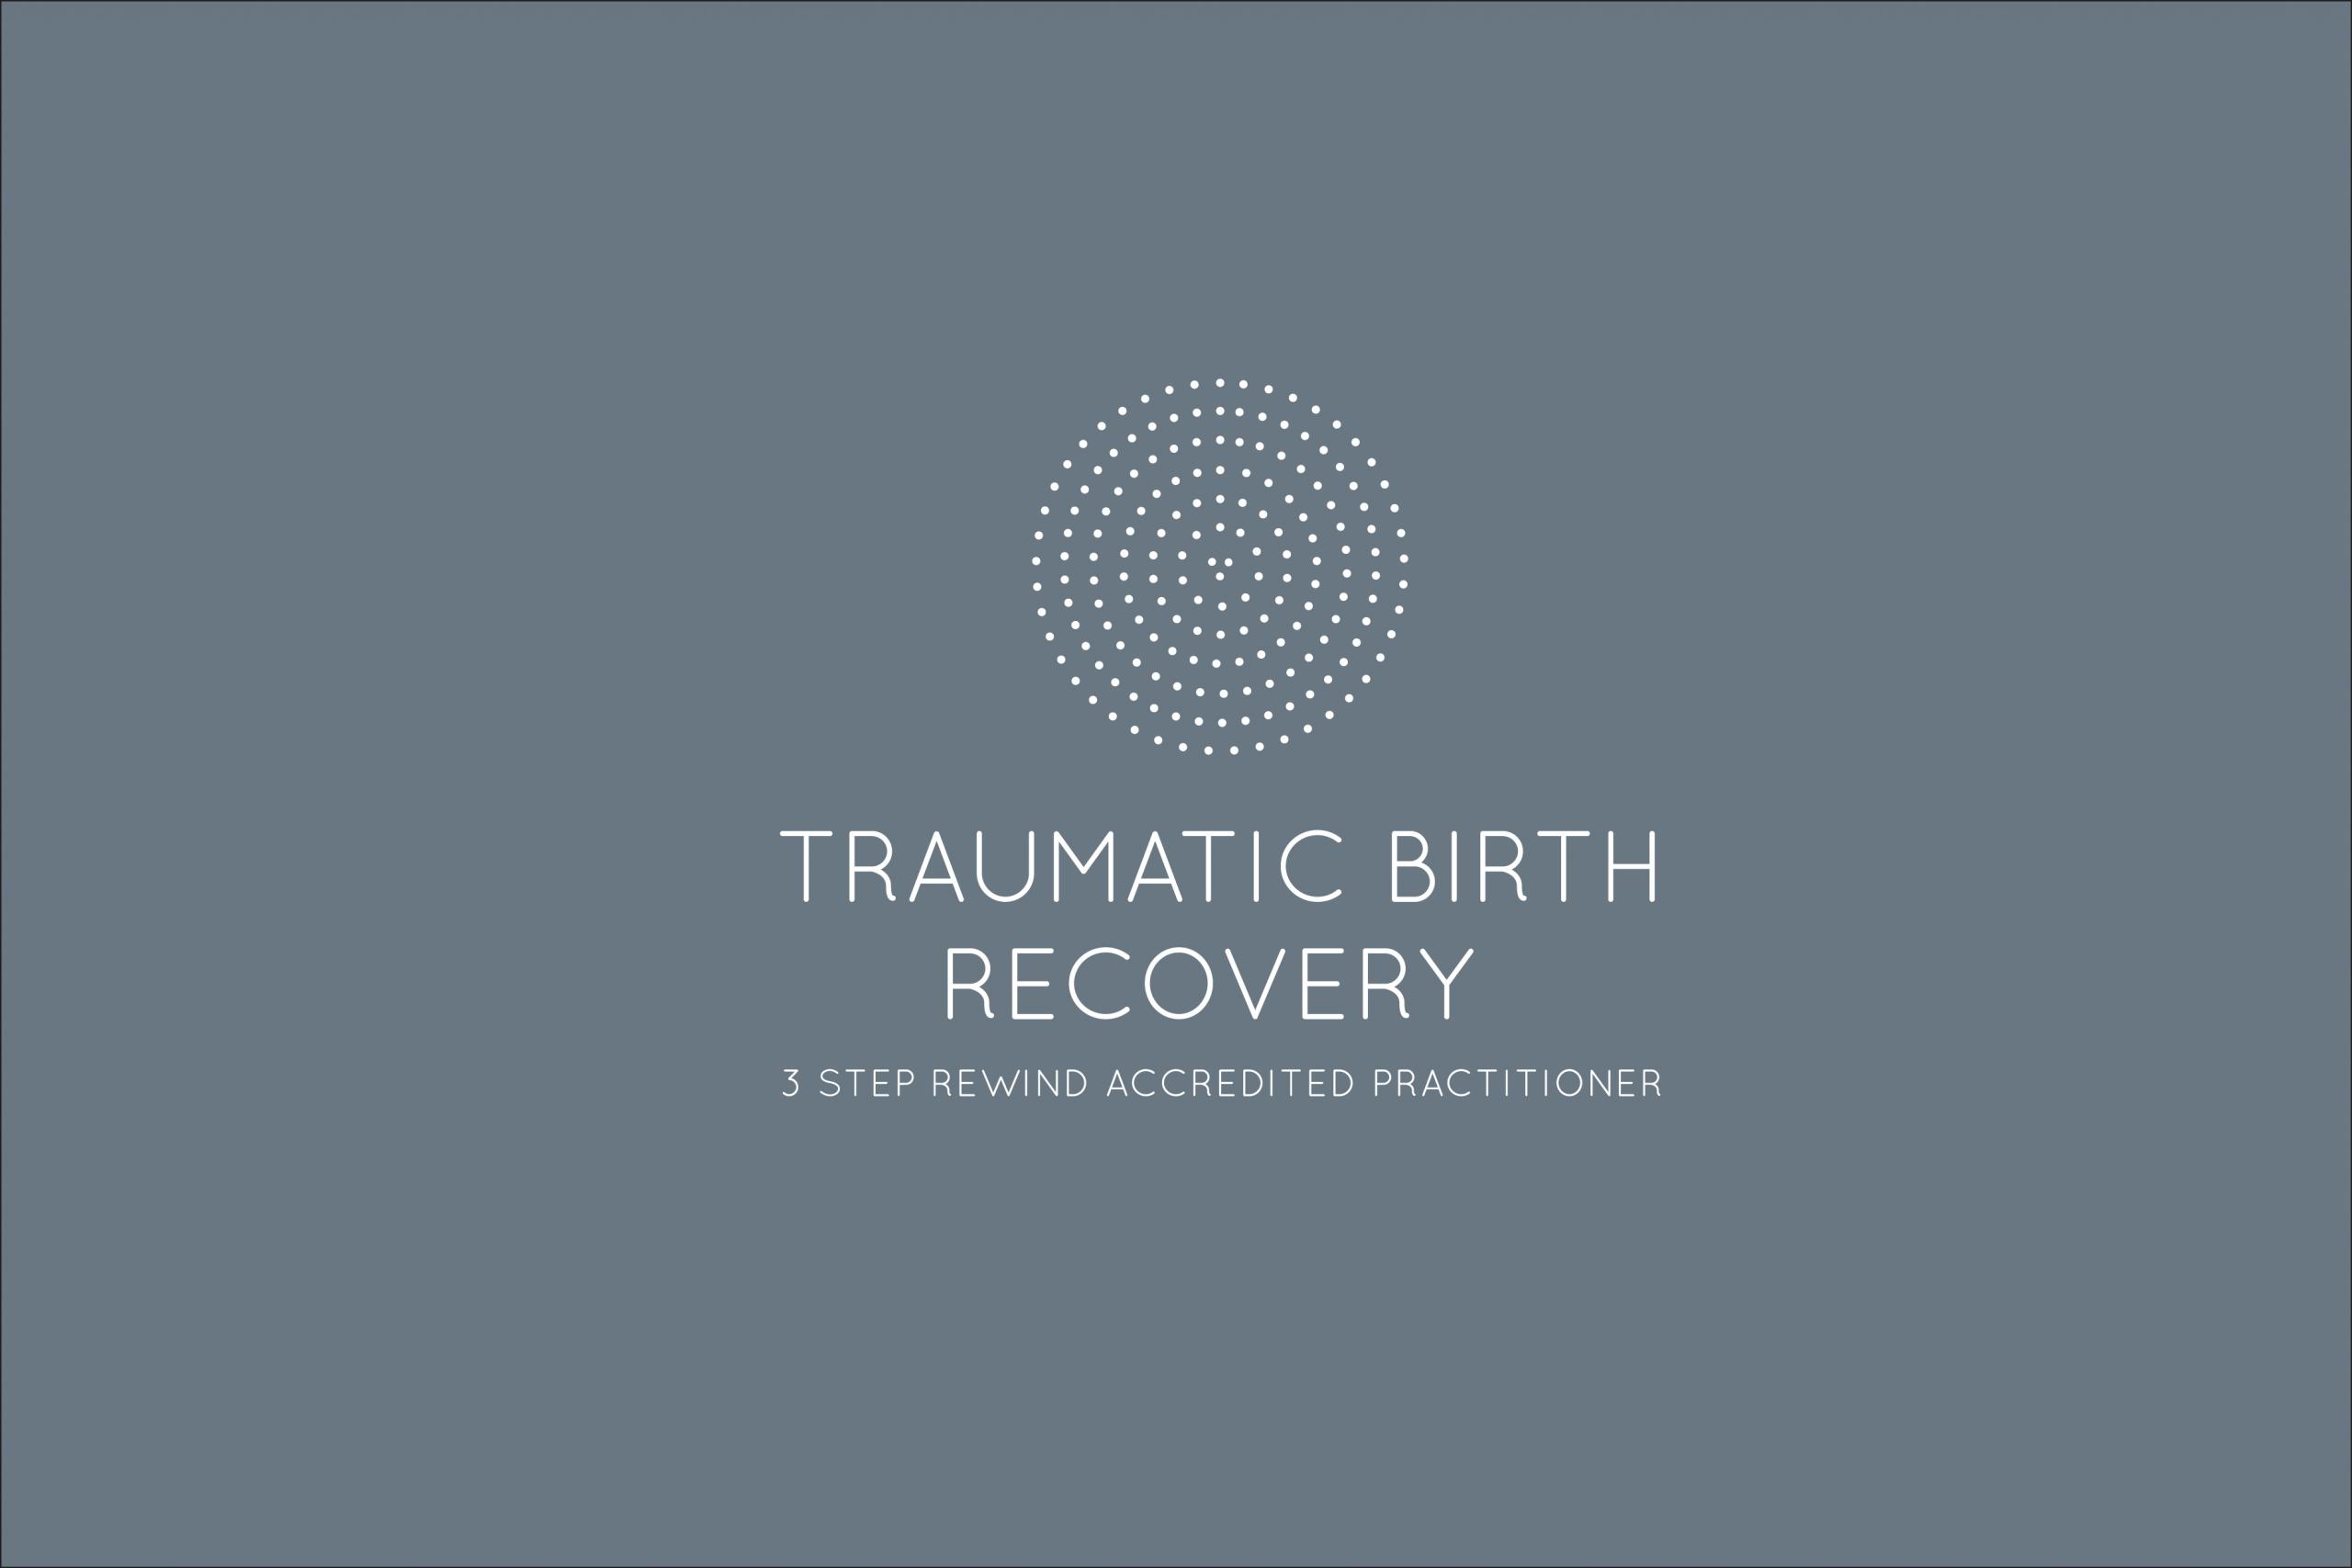 Traumatic Birth Recovery Logo